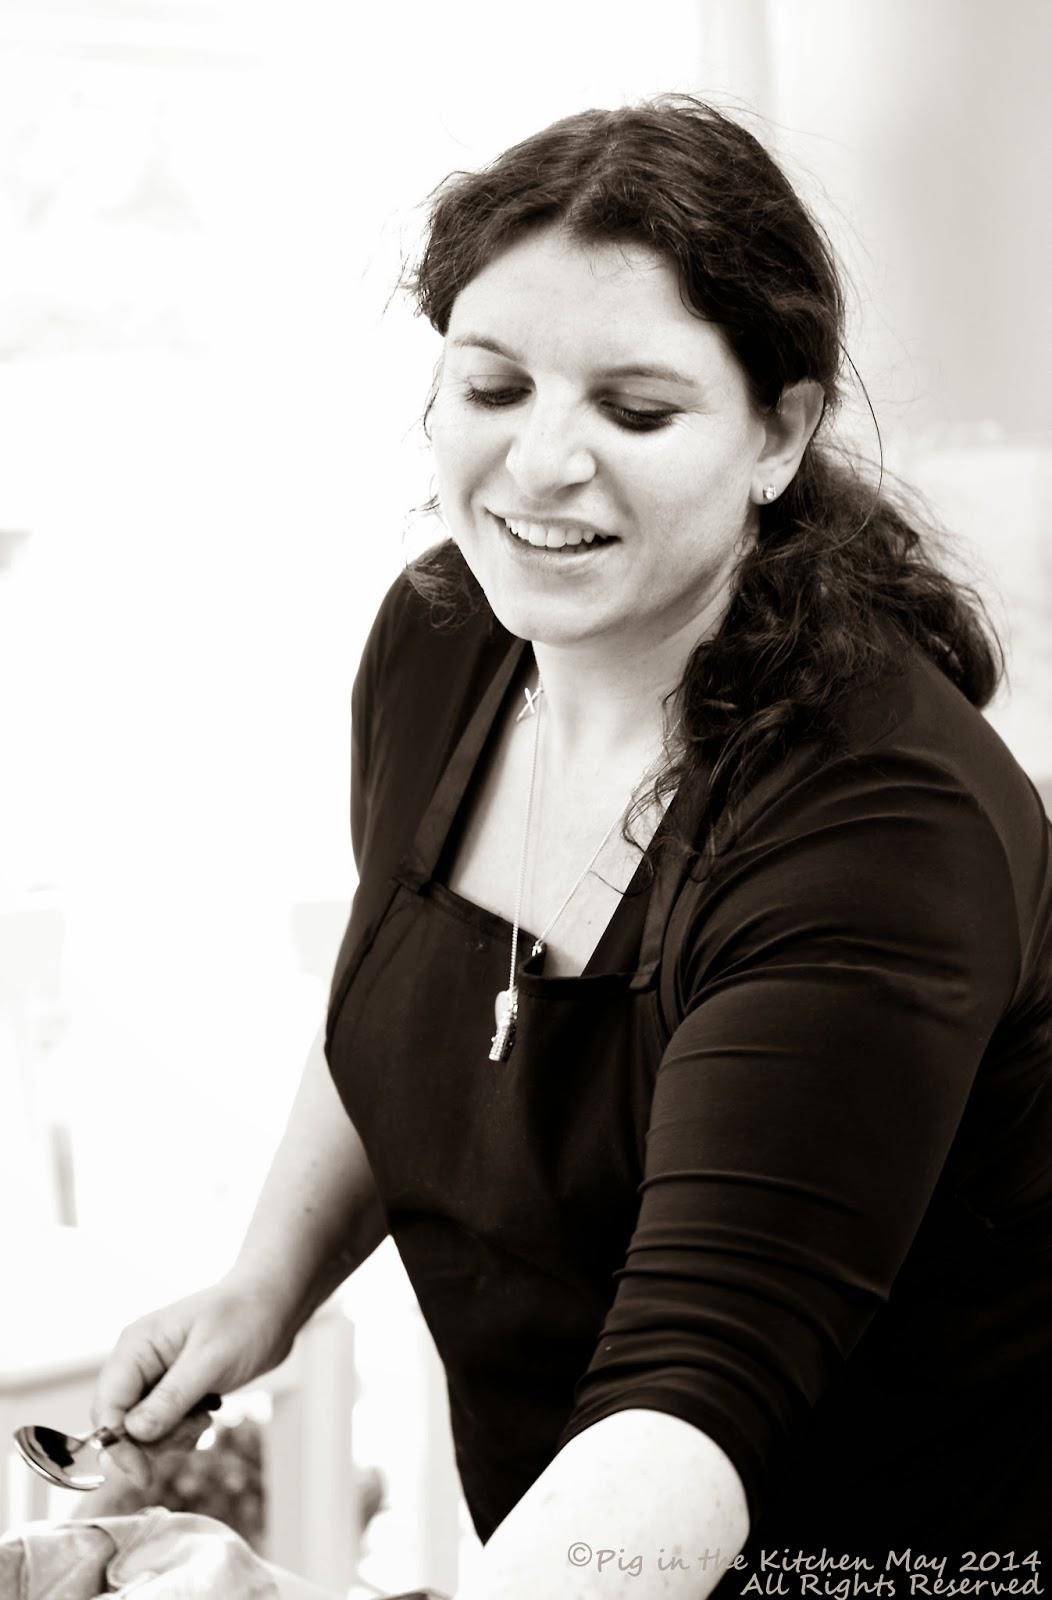 Vanessa Kimbell, food stylist and photographer